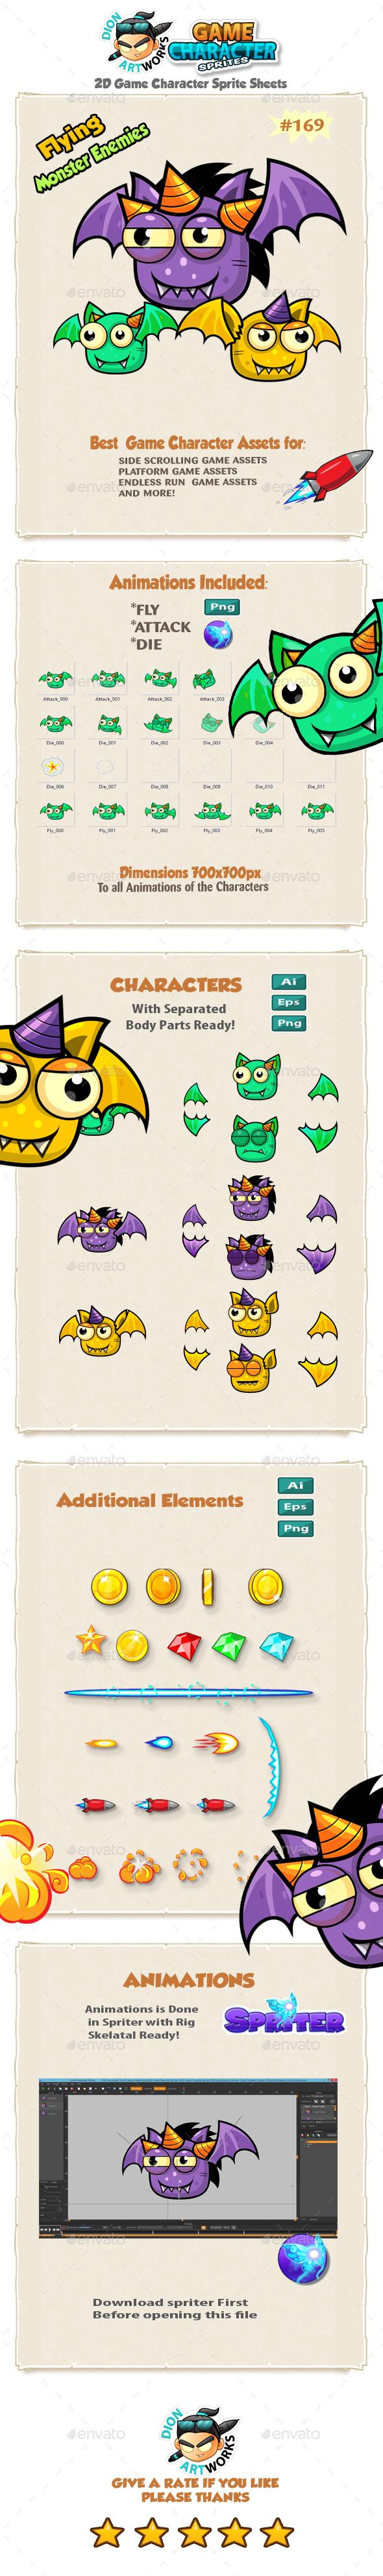 Flying Monster Enemies  Game Character Sprites 169 - Sprites Game Assets